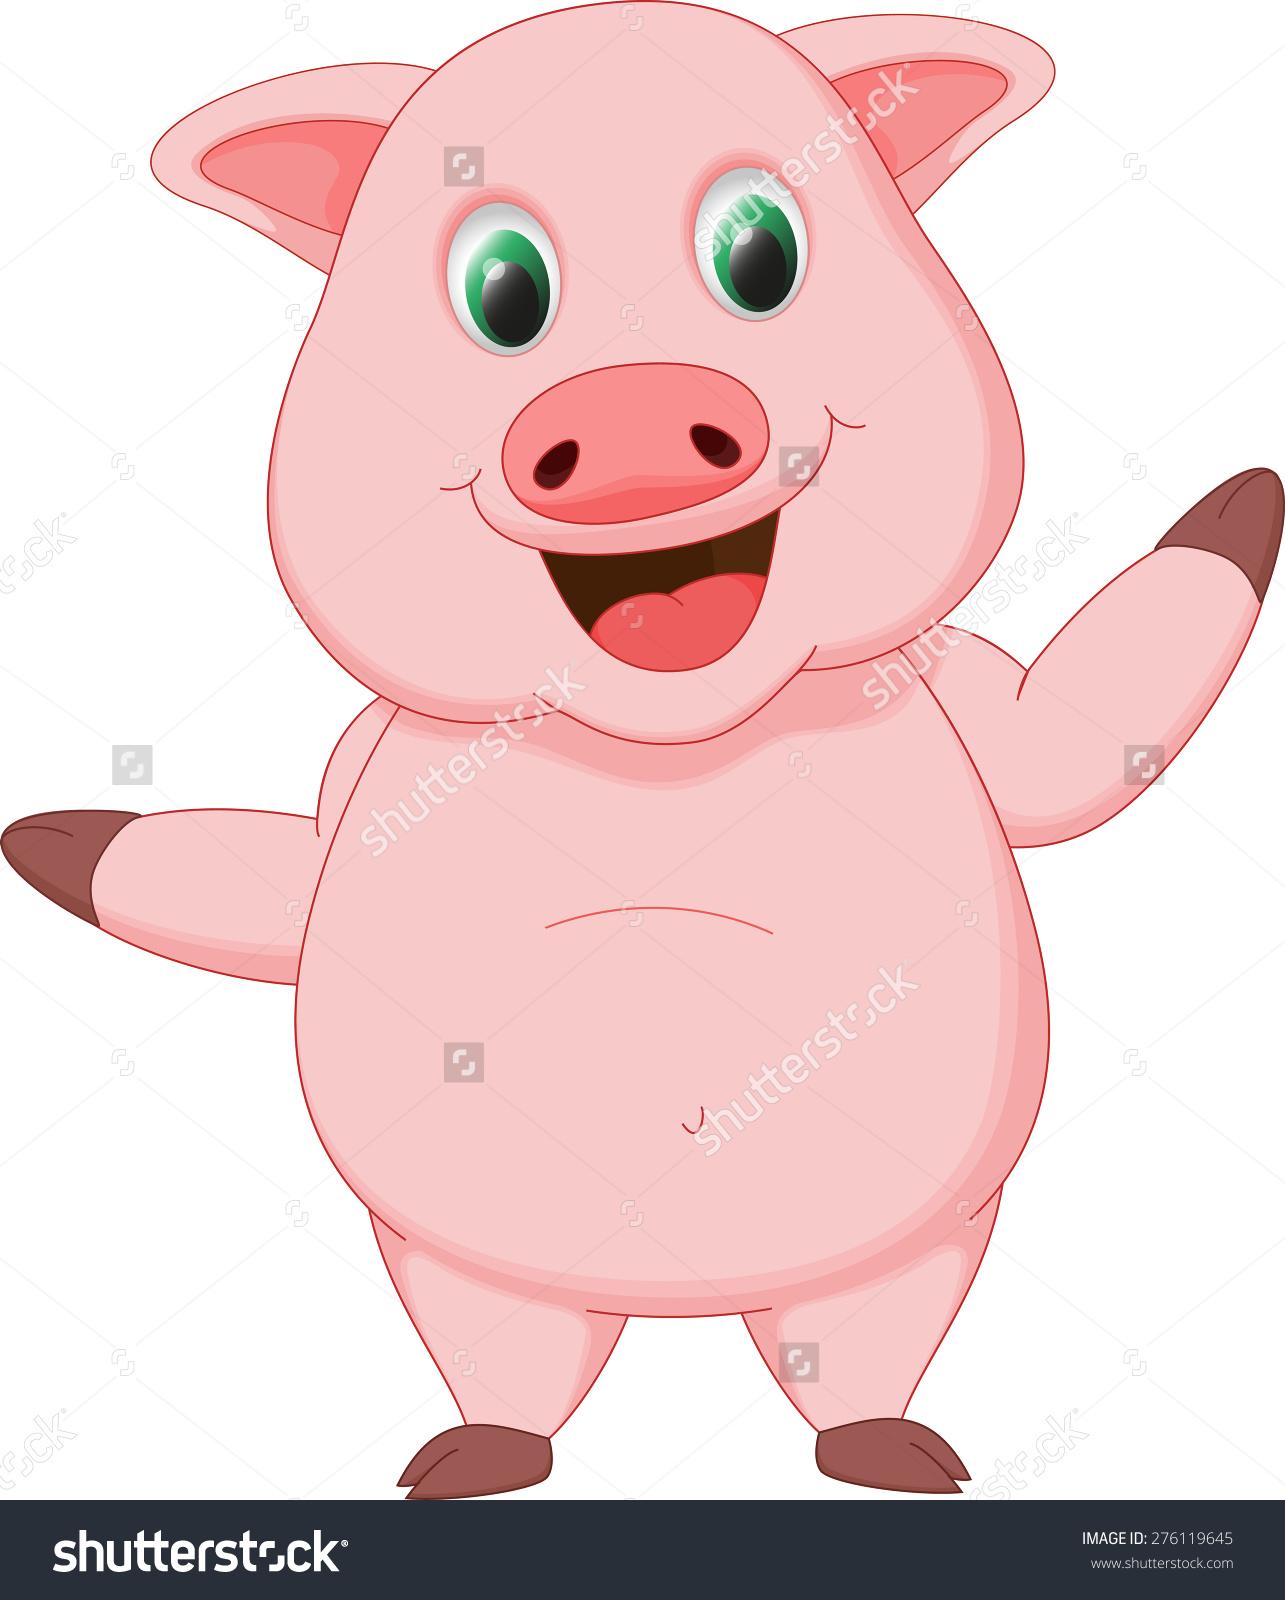 Happy Pig Cartoon Stock Vector 276119645.